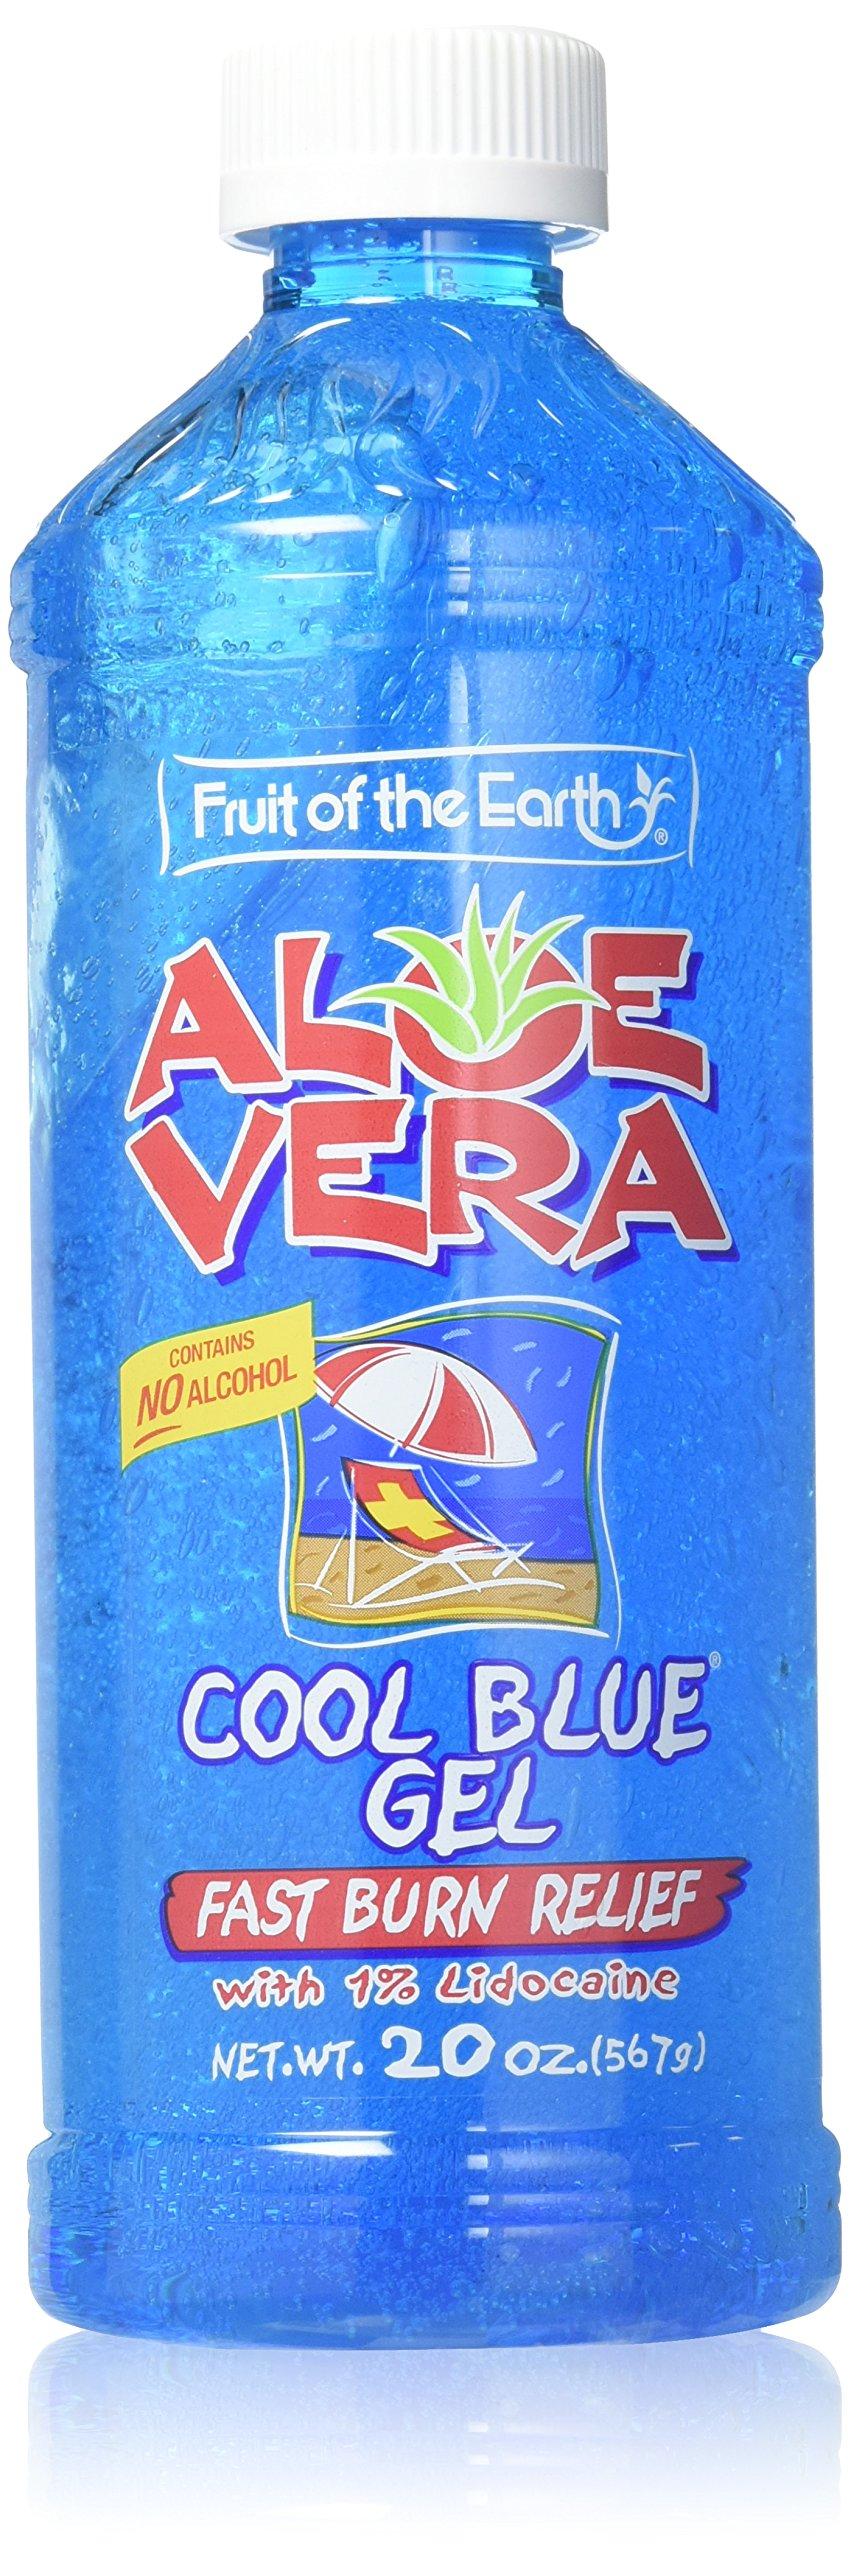 Aloe Vera Cool Blue Gel With 1 Lidocain Buy Online In China At Desertcart